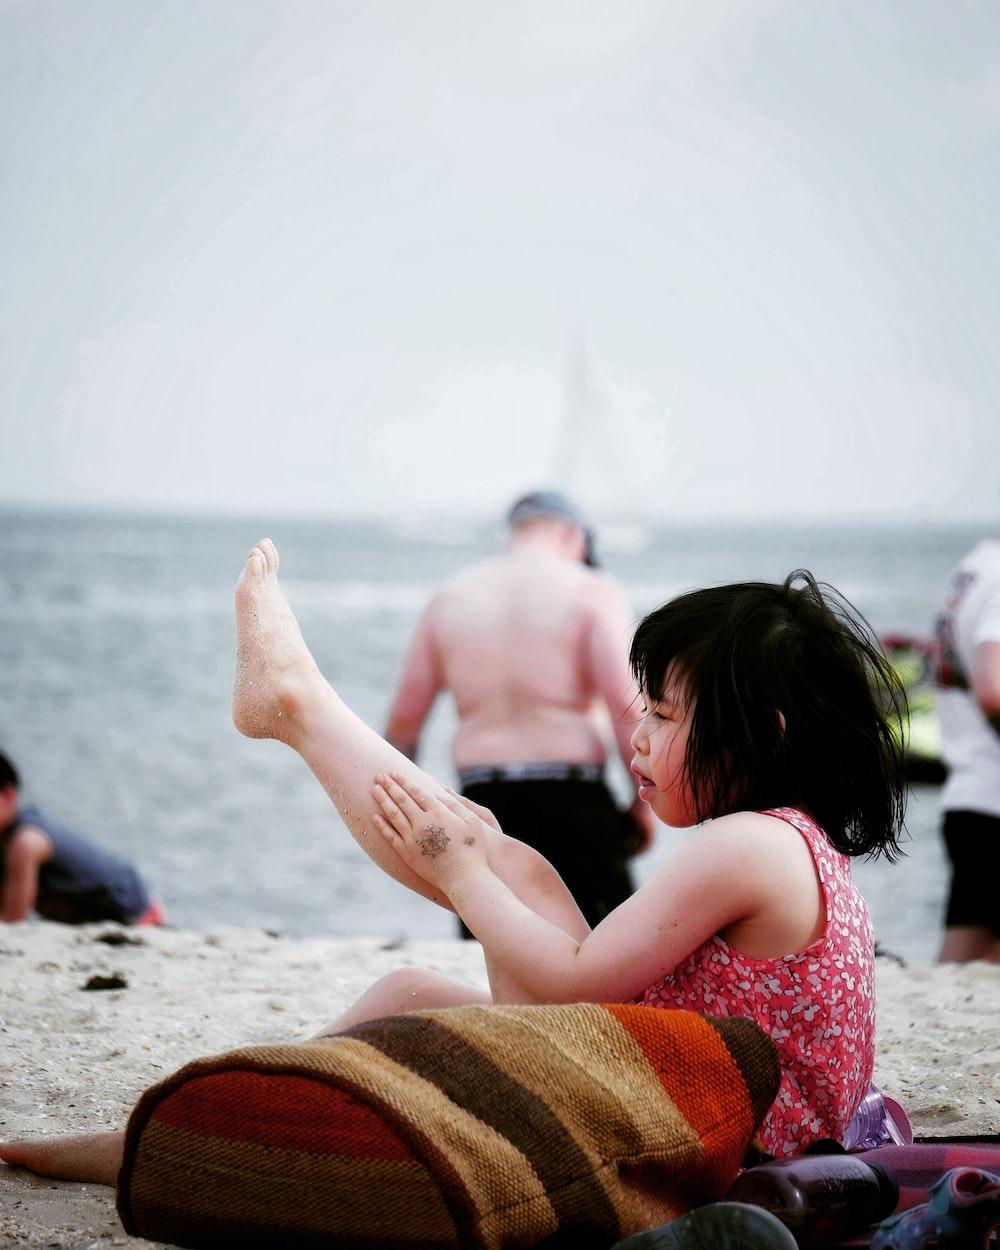 2 women sitting on beach shore during daytime